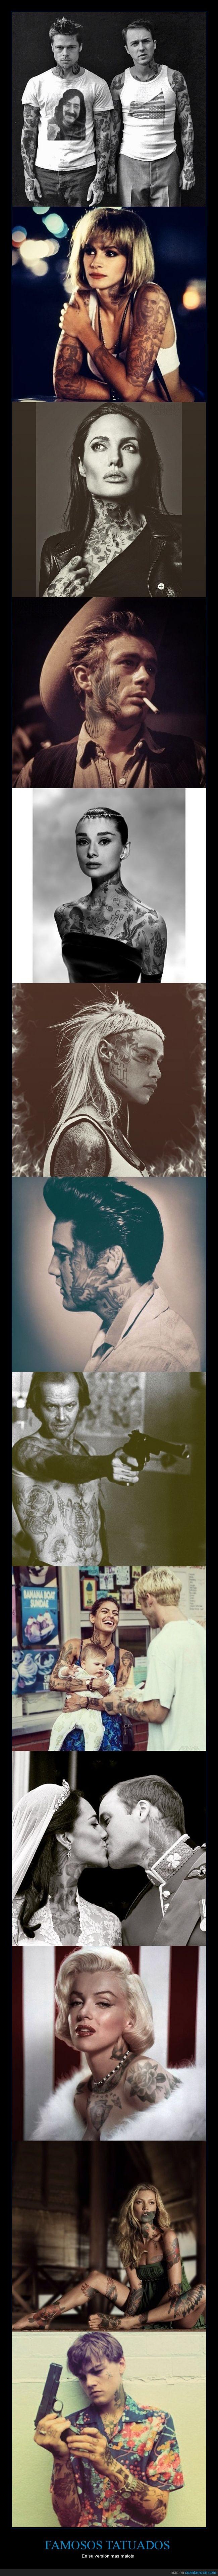 Elvis,Emilia Clarke,eva mendes,famoso,James Dean,Julia roberts,kate moss,Katherine Hepburn,Leonardo Dicaprio,malota,malote,marilyn monroe,principe,tattoo,tatuaje,versión